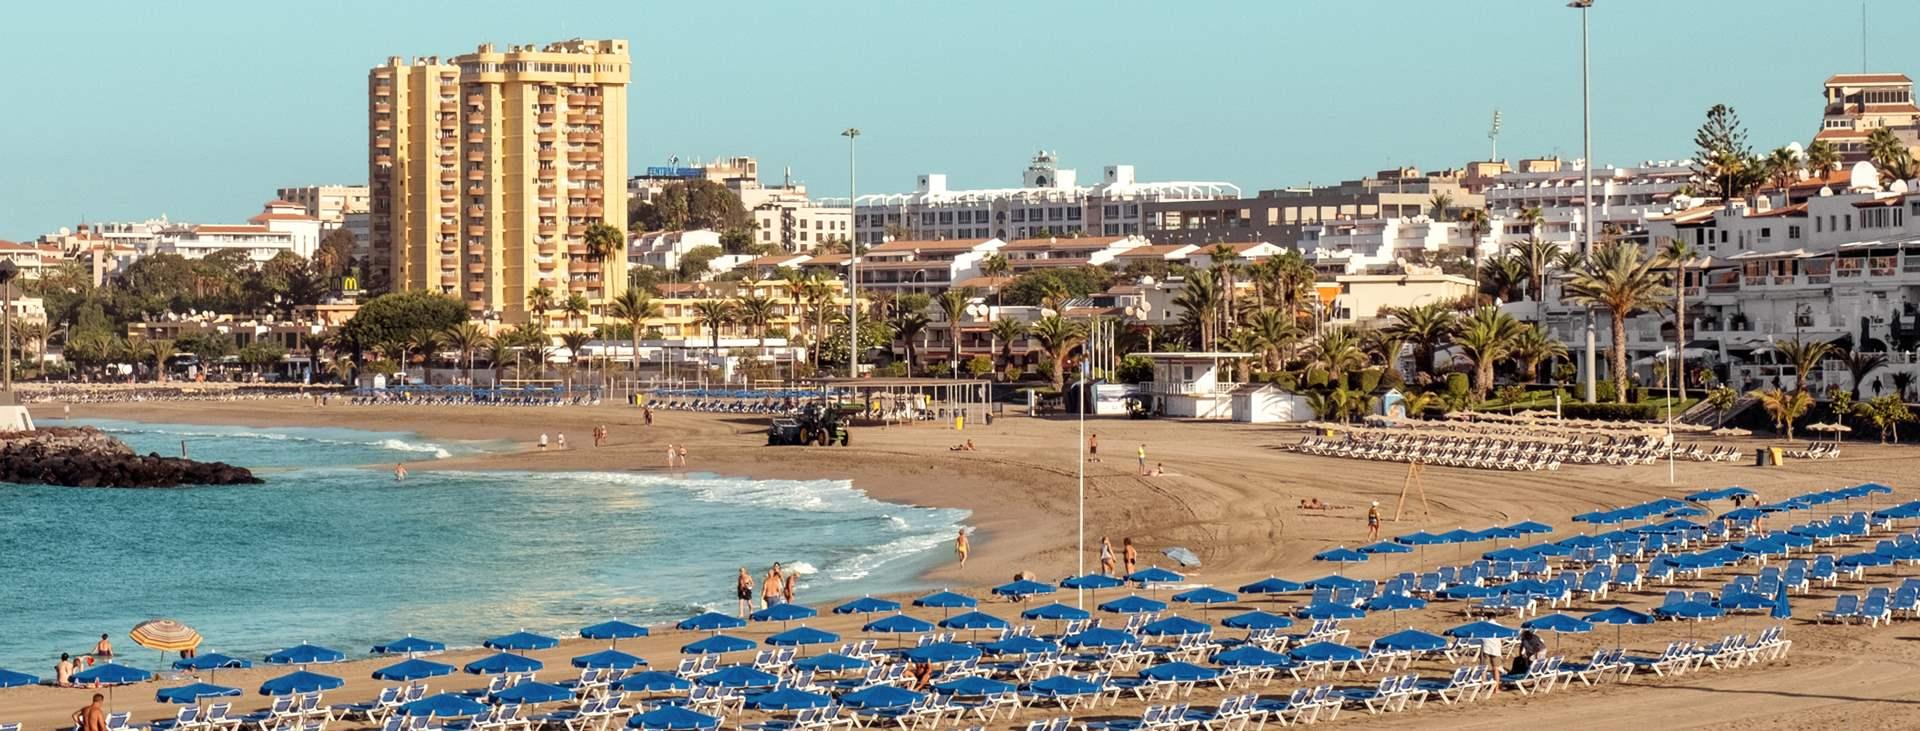 Bestill en reise til Playa de las Américas på Tenerife med Ving